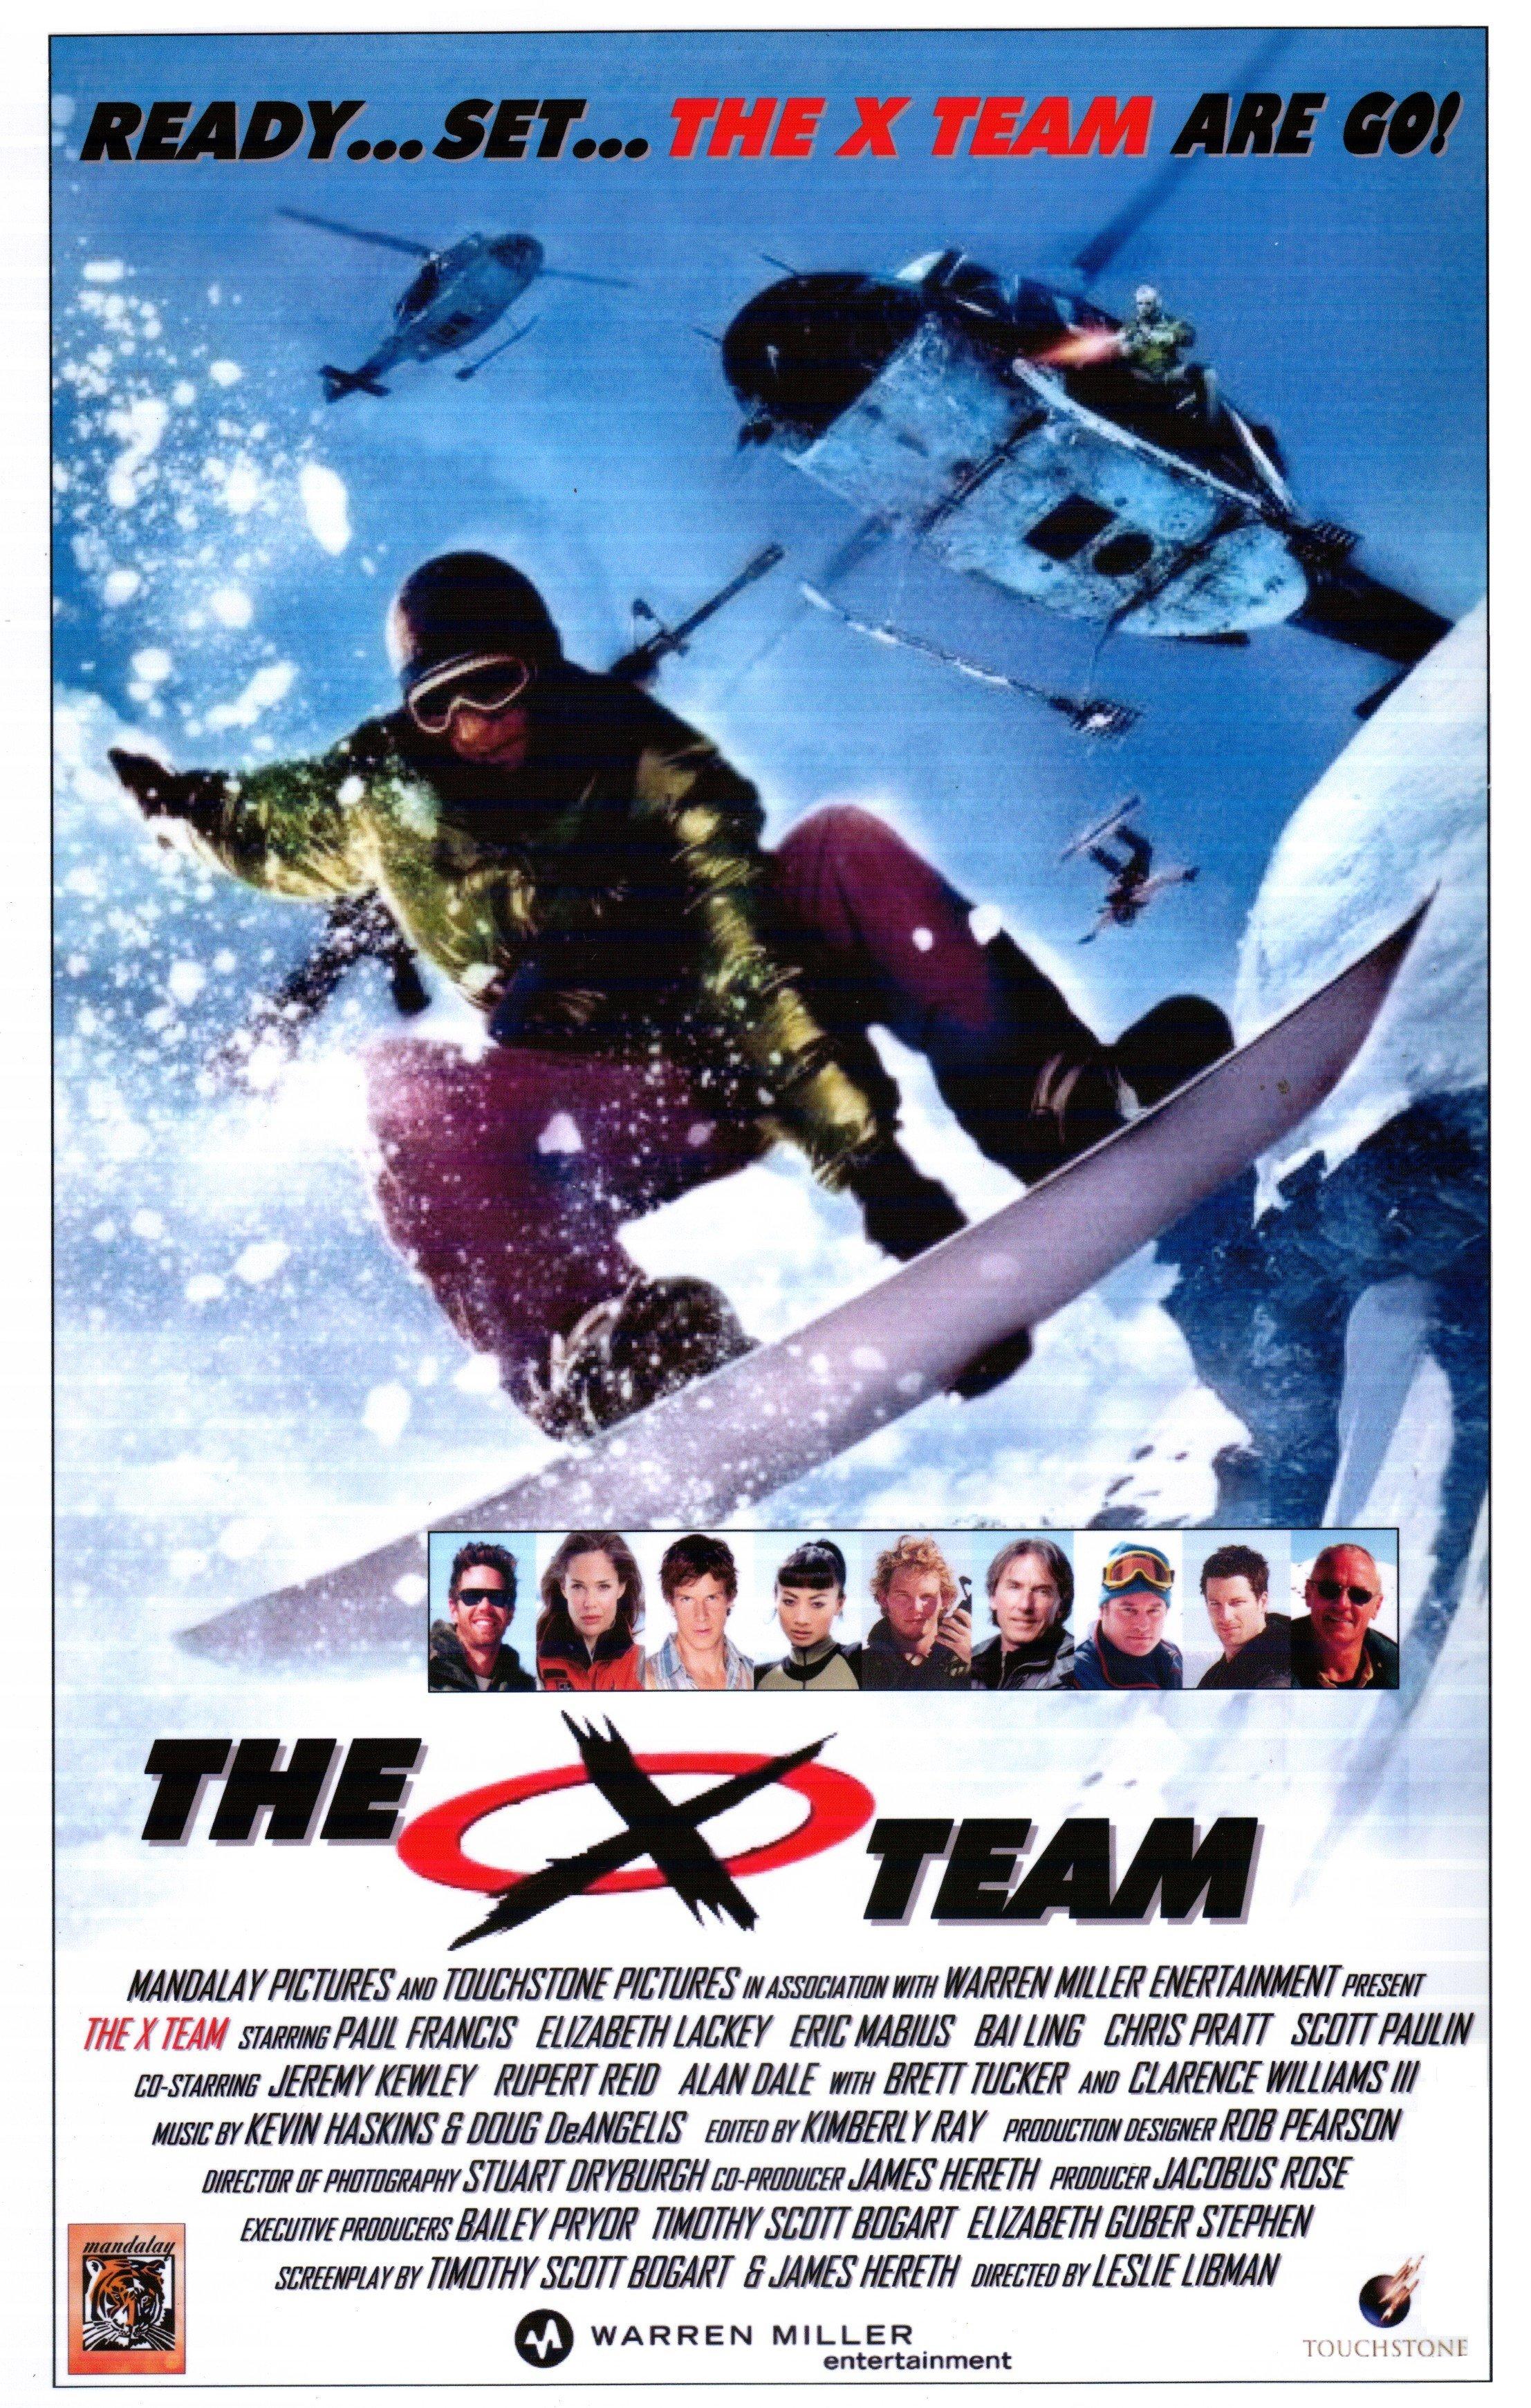 The Extreme Team 2003 Imdb